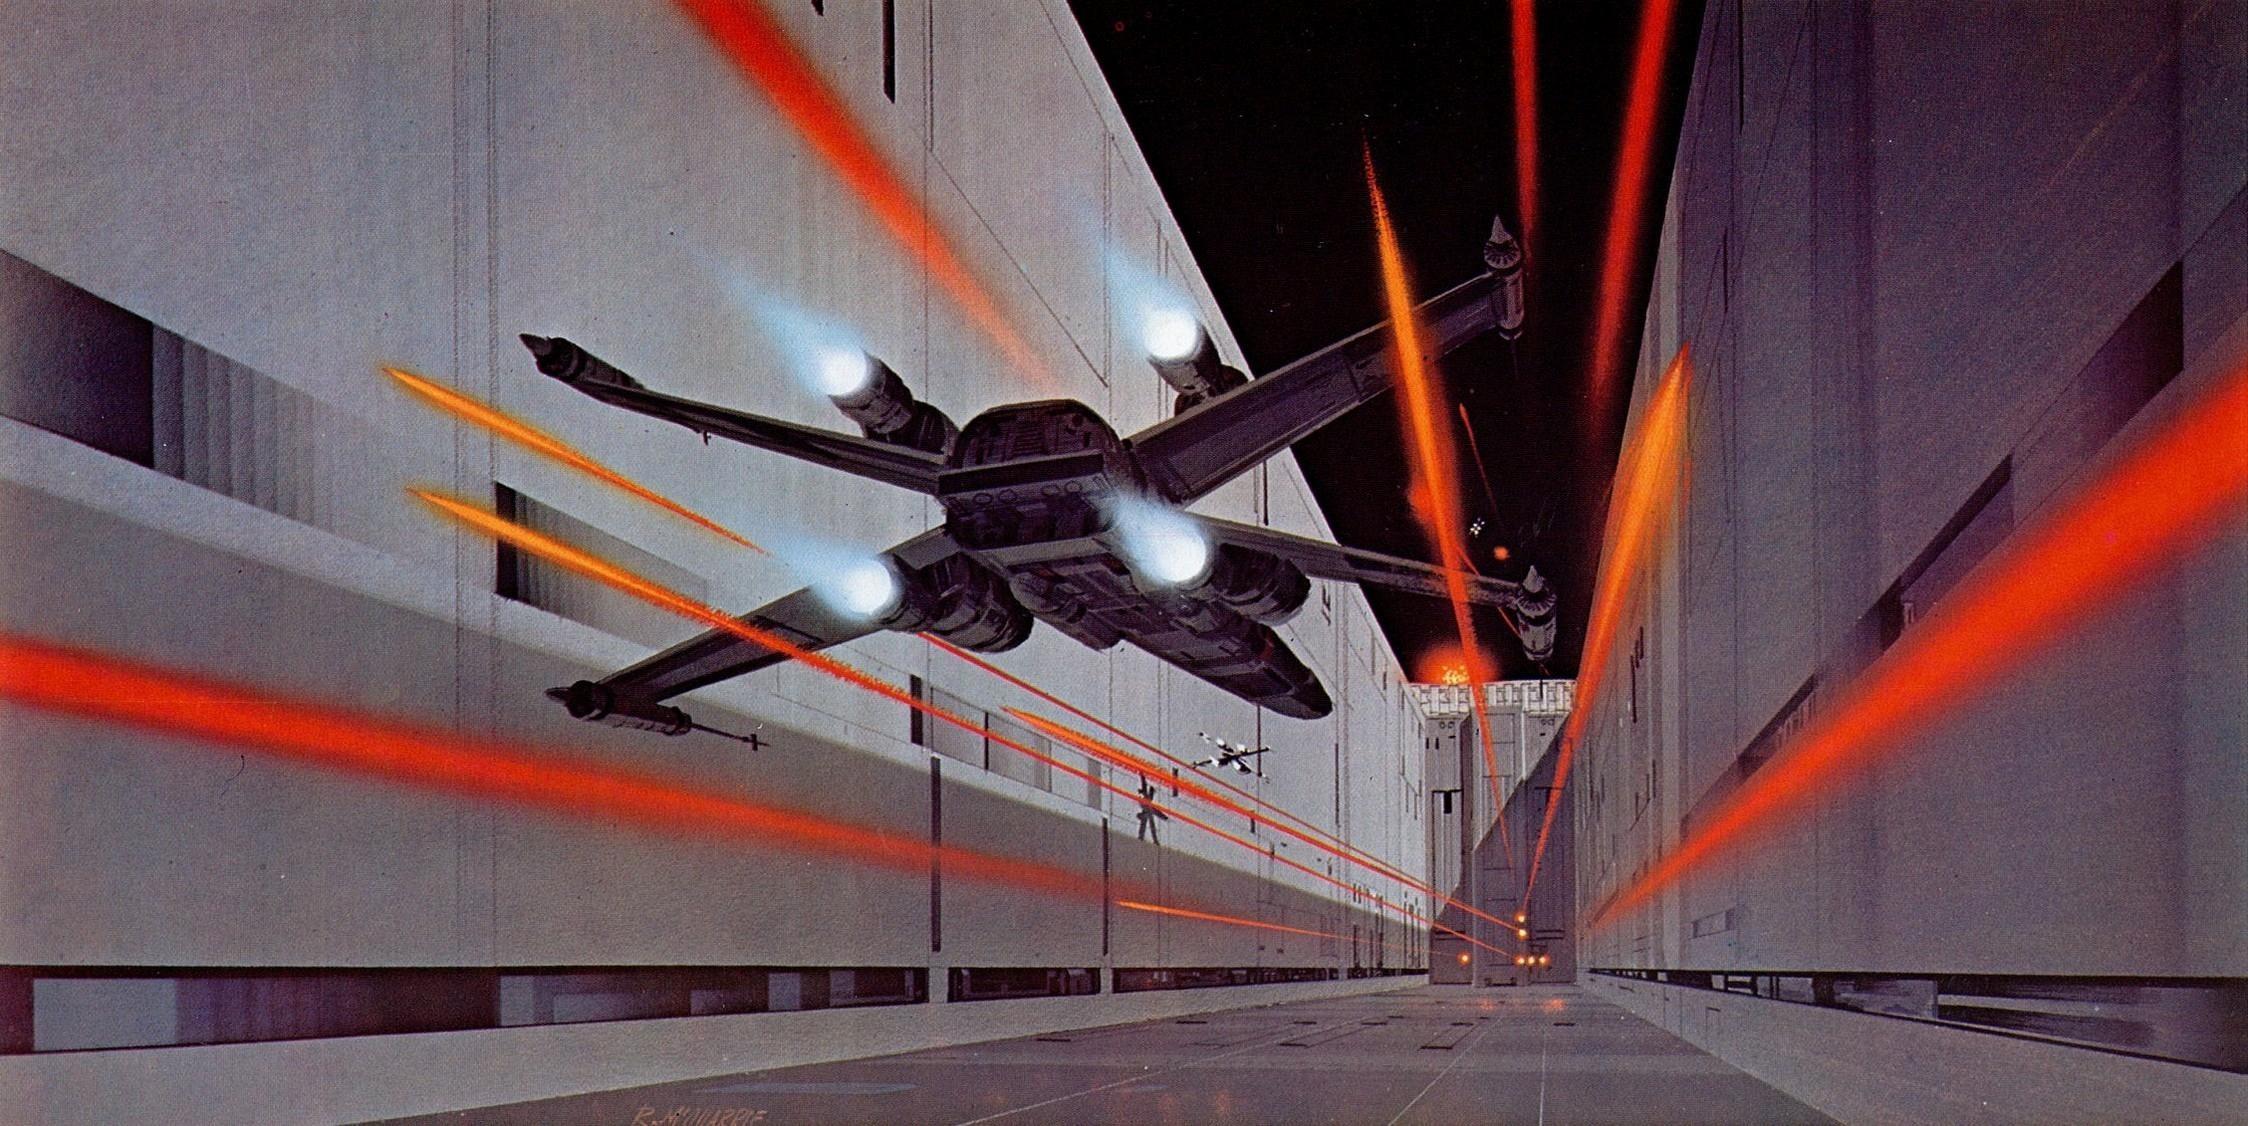 X-Wing-Vs-Death-Star-wallpaper